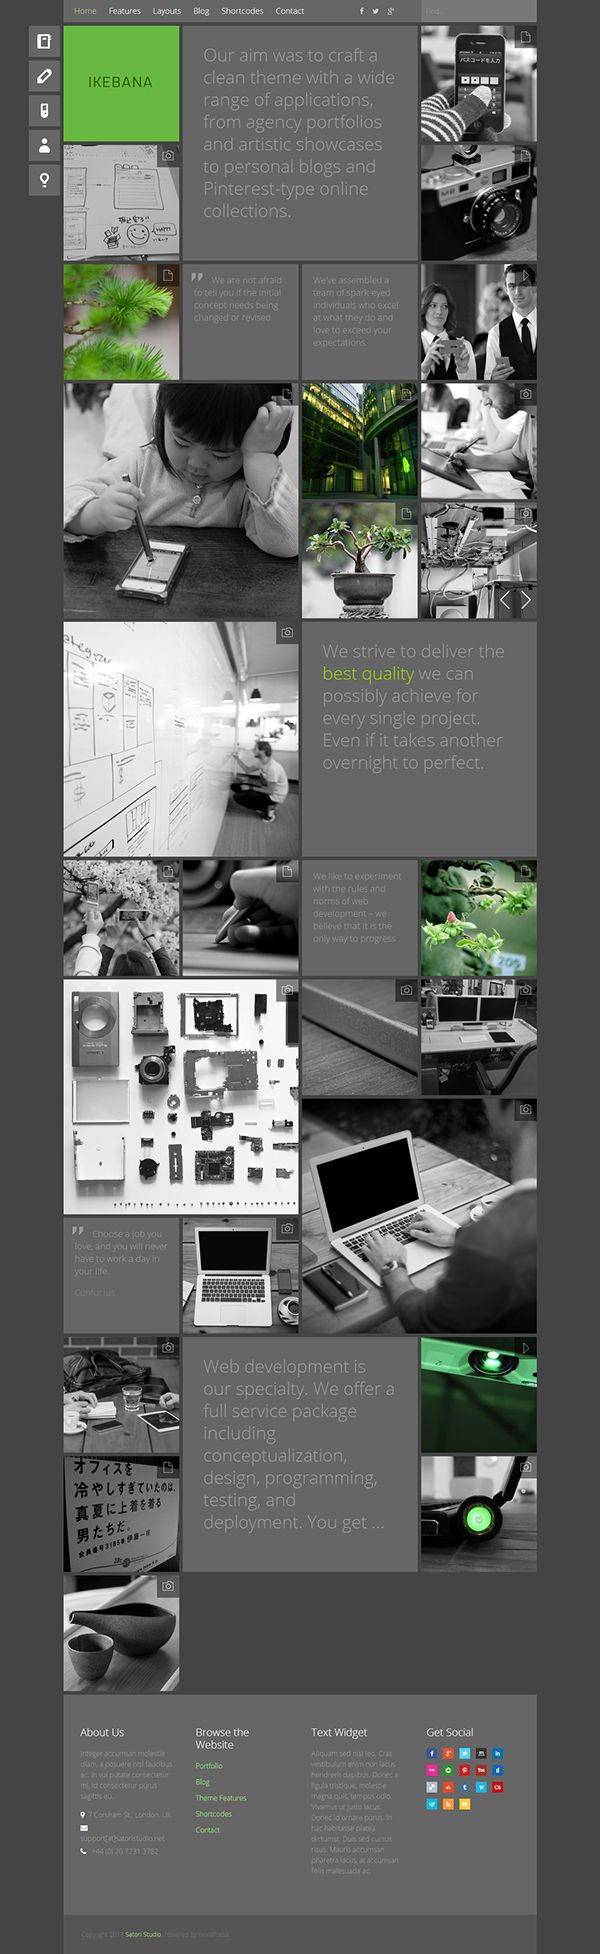 Ikebana - WP Portfolio Theme on Behance